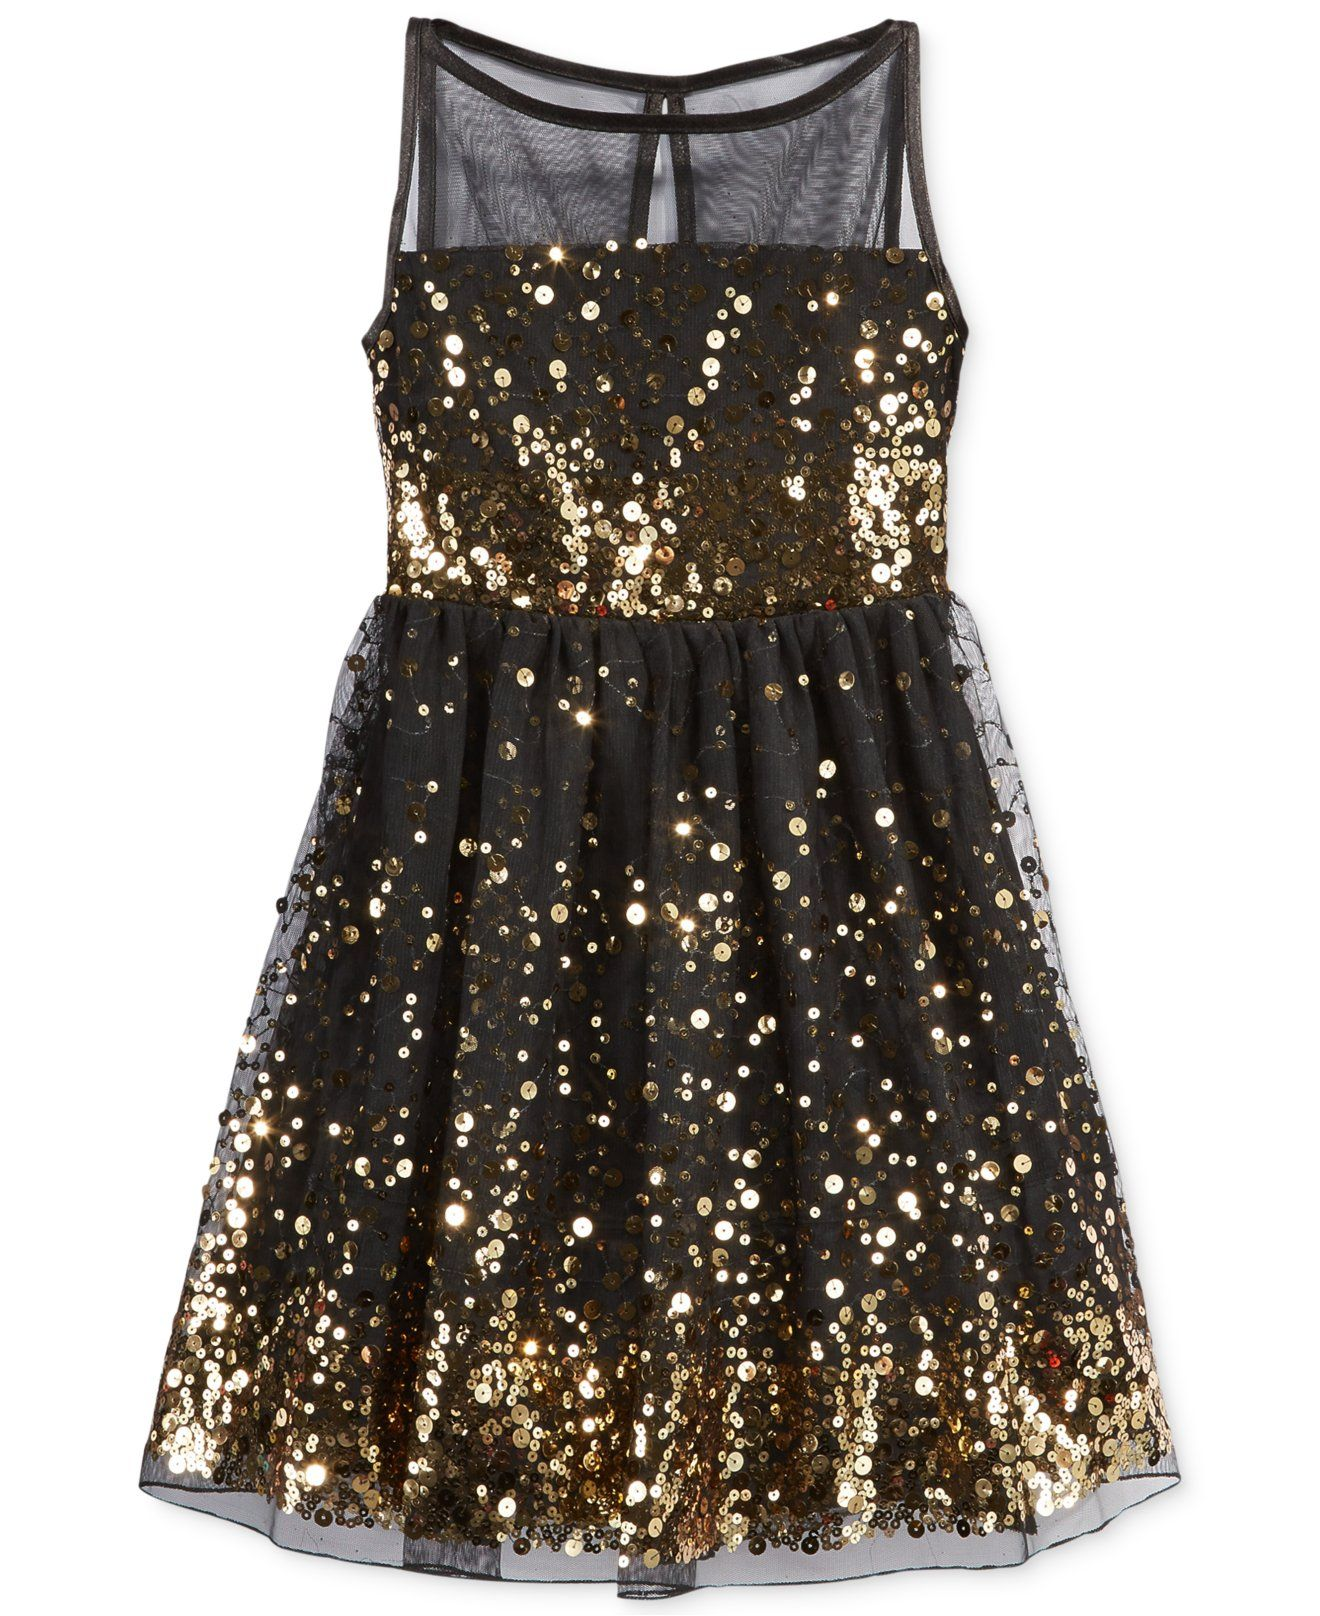 Flowermodels Candy Dolls Illusion: Ruby Rox Girls' Sequin Illusion Dress